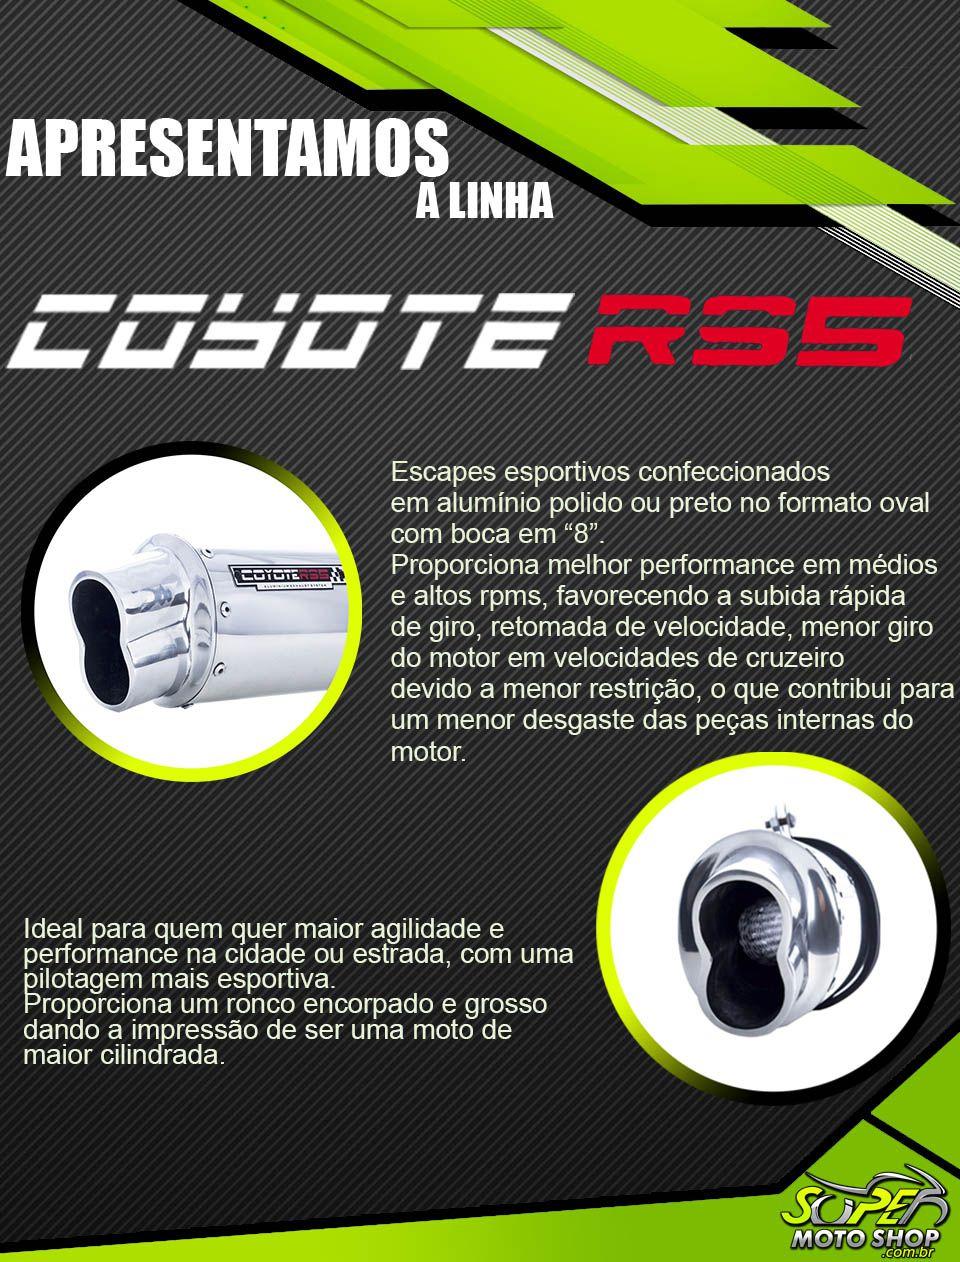 Escape / Ponteira Coyote RS5 Boca 8 Aluminio Oval - YBR / Factor 125 - Yamaha - Dourado